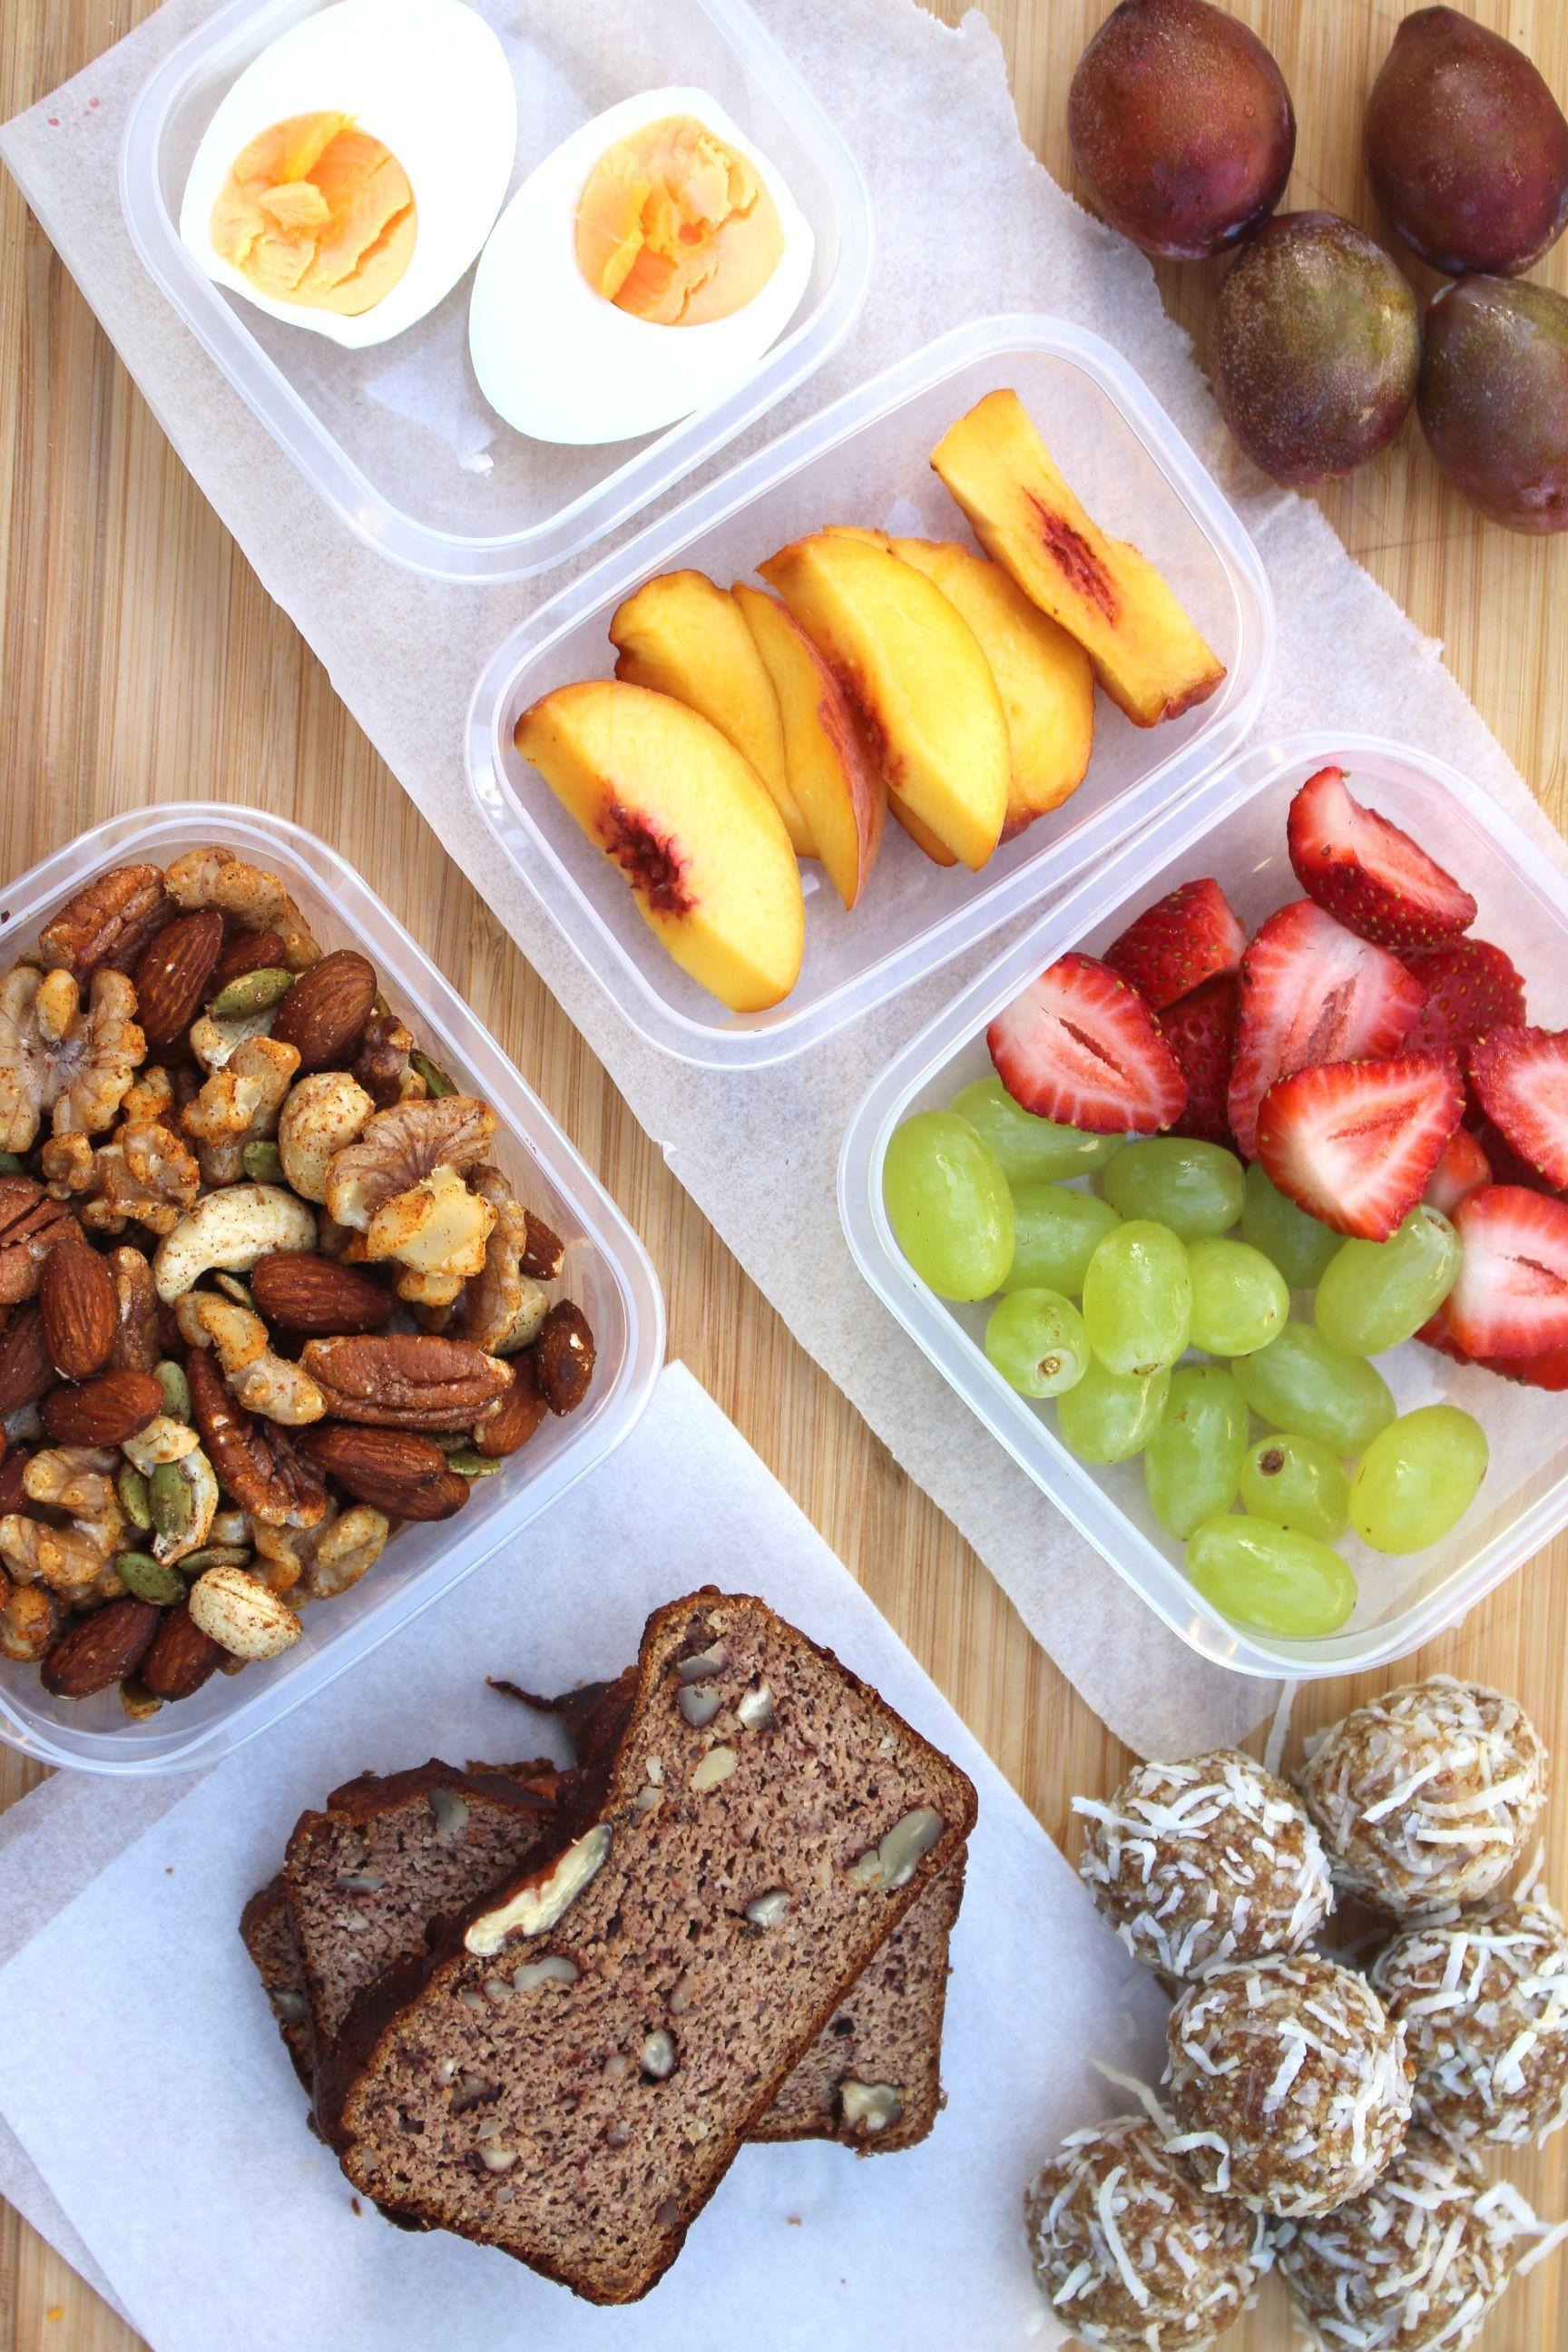 Healthy Plane Snacks  Real Food For Plane Flights